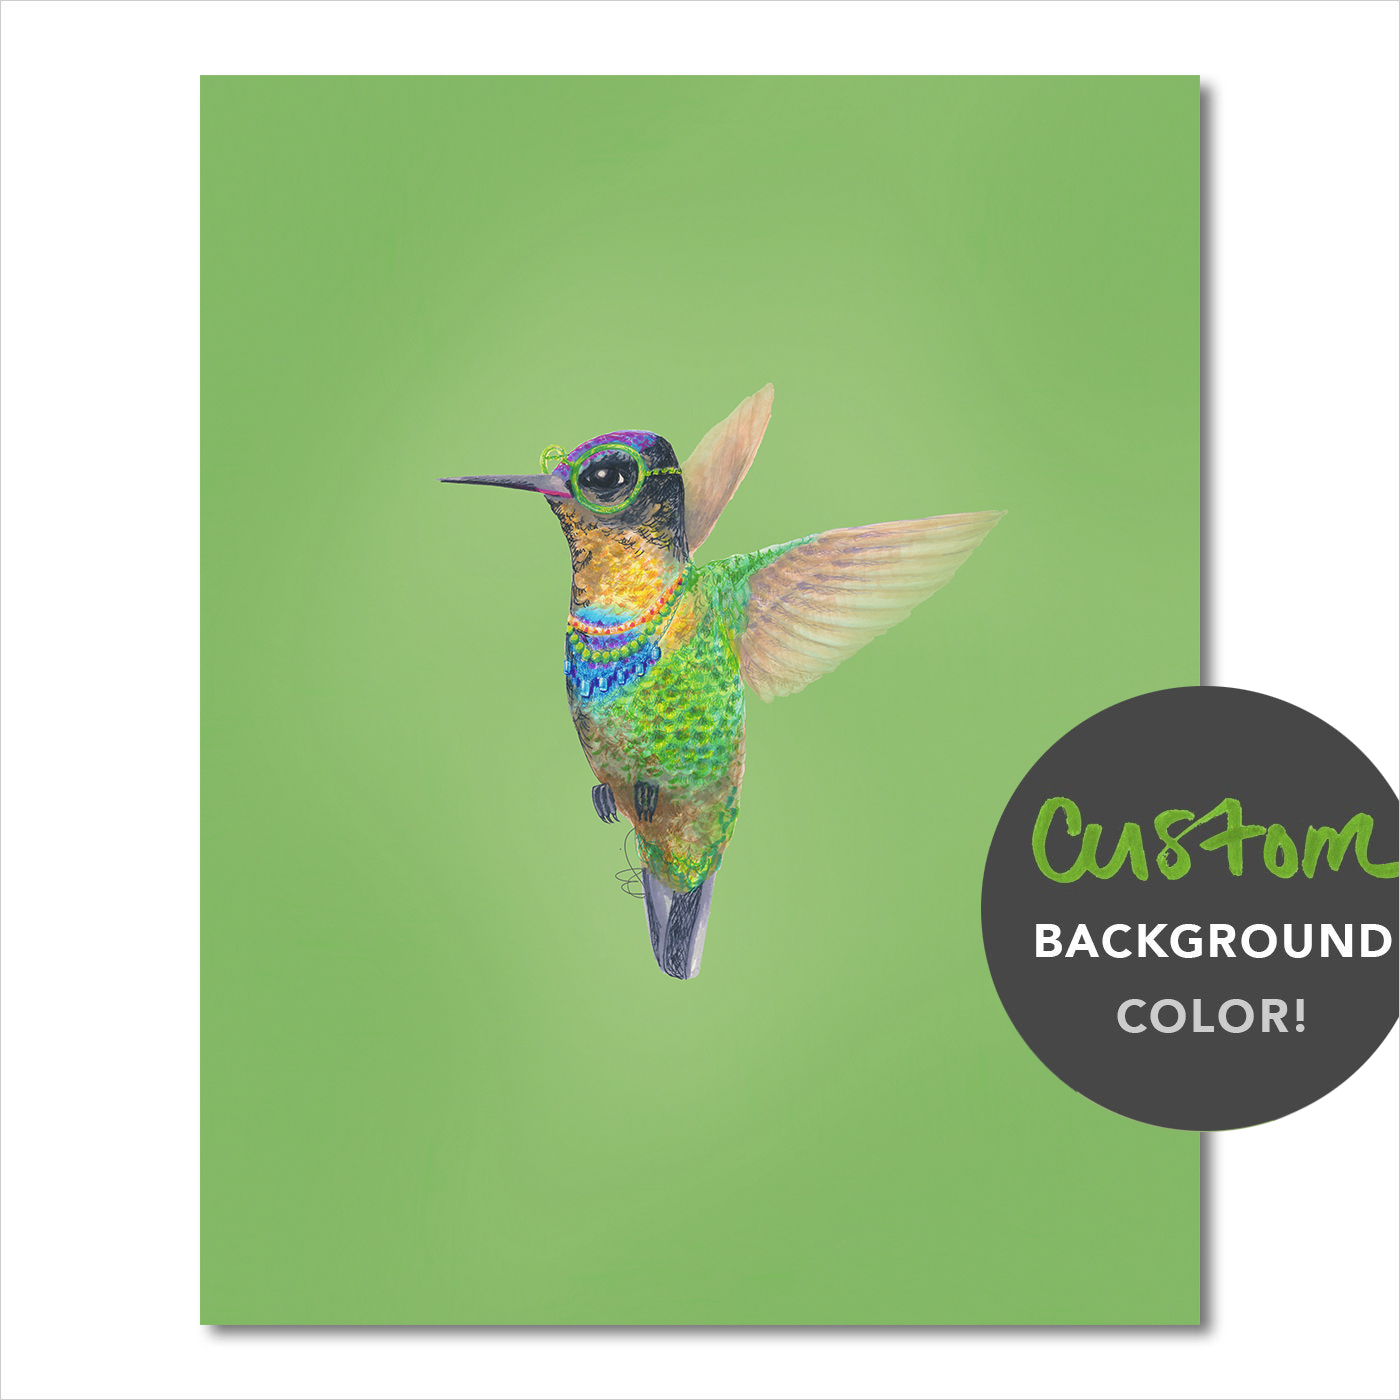 hummingbird-first-image_sRGB